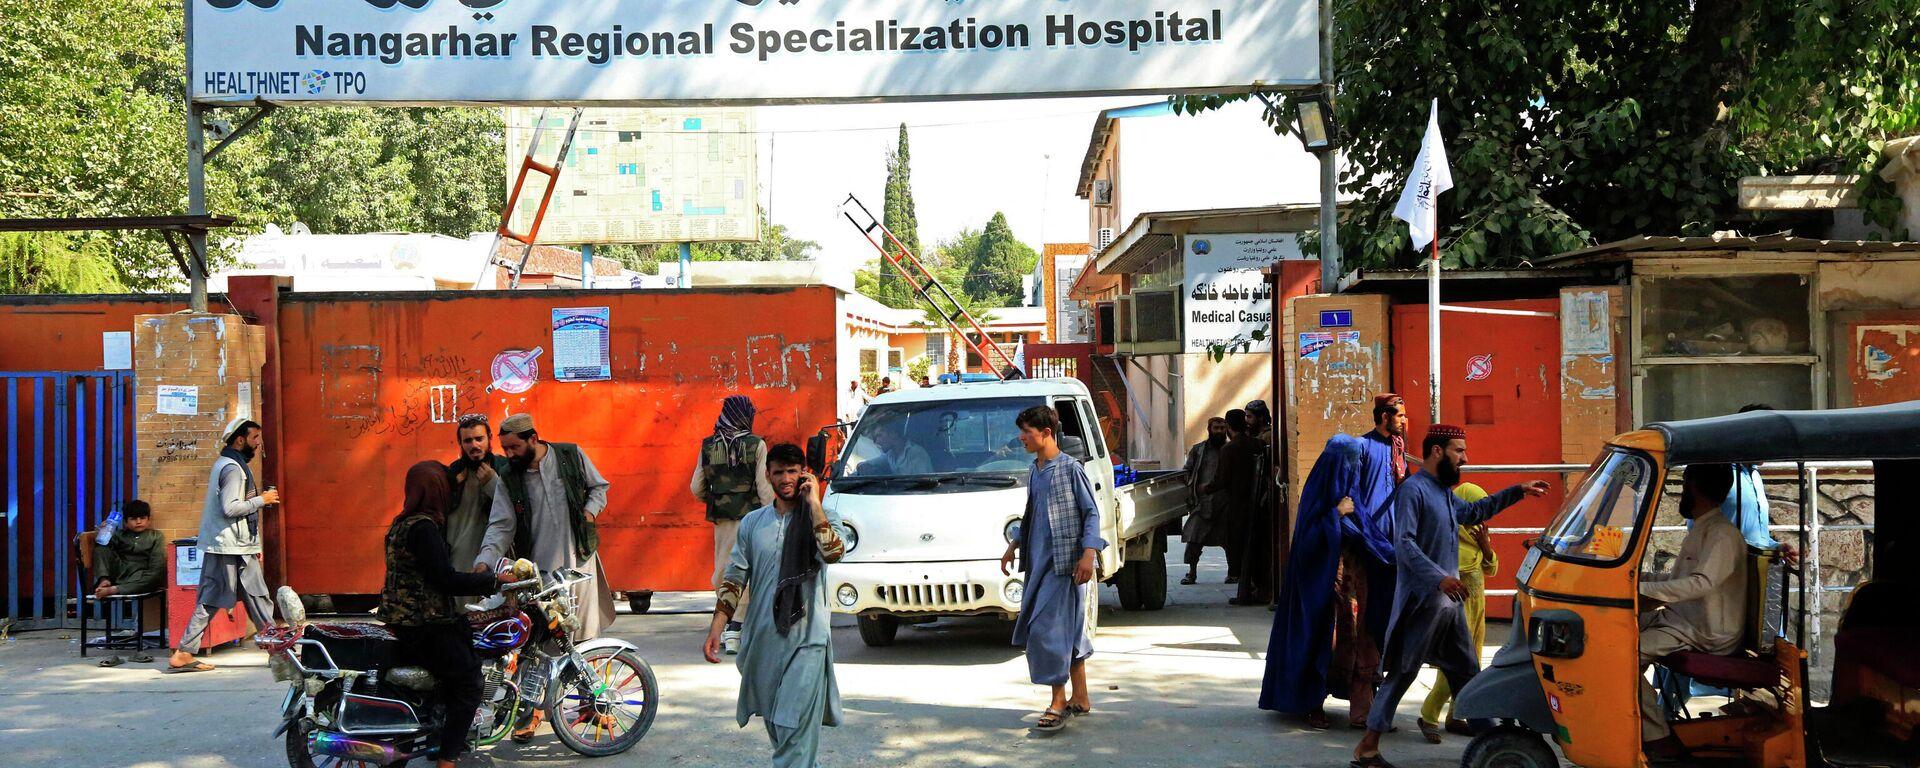 Afghanische Menschen vor dem Nangarhar Regional Specialization Hospital - SNA, 1920, 18.09.2021